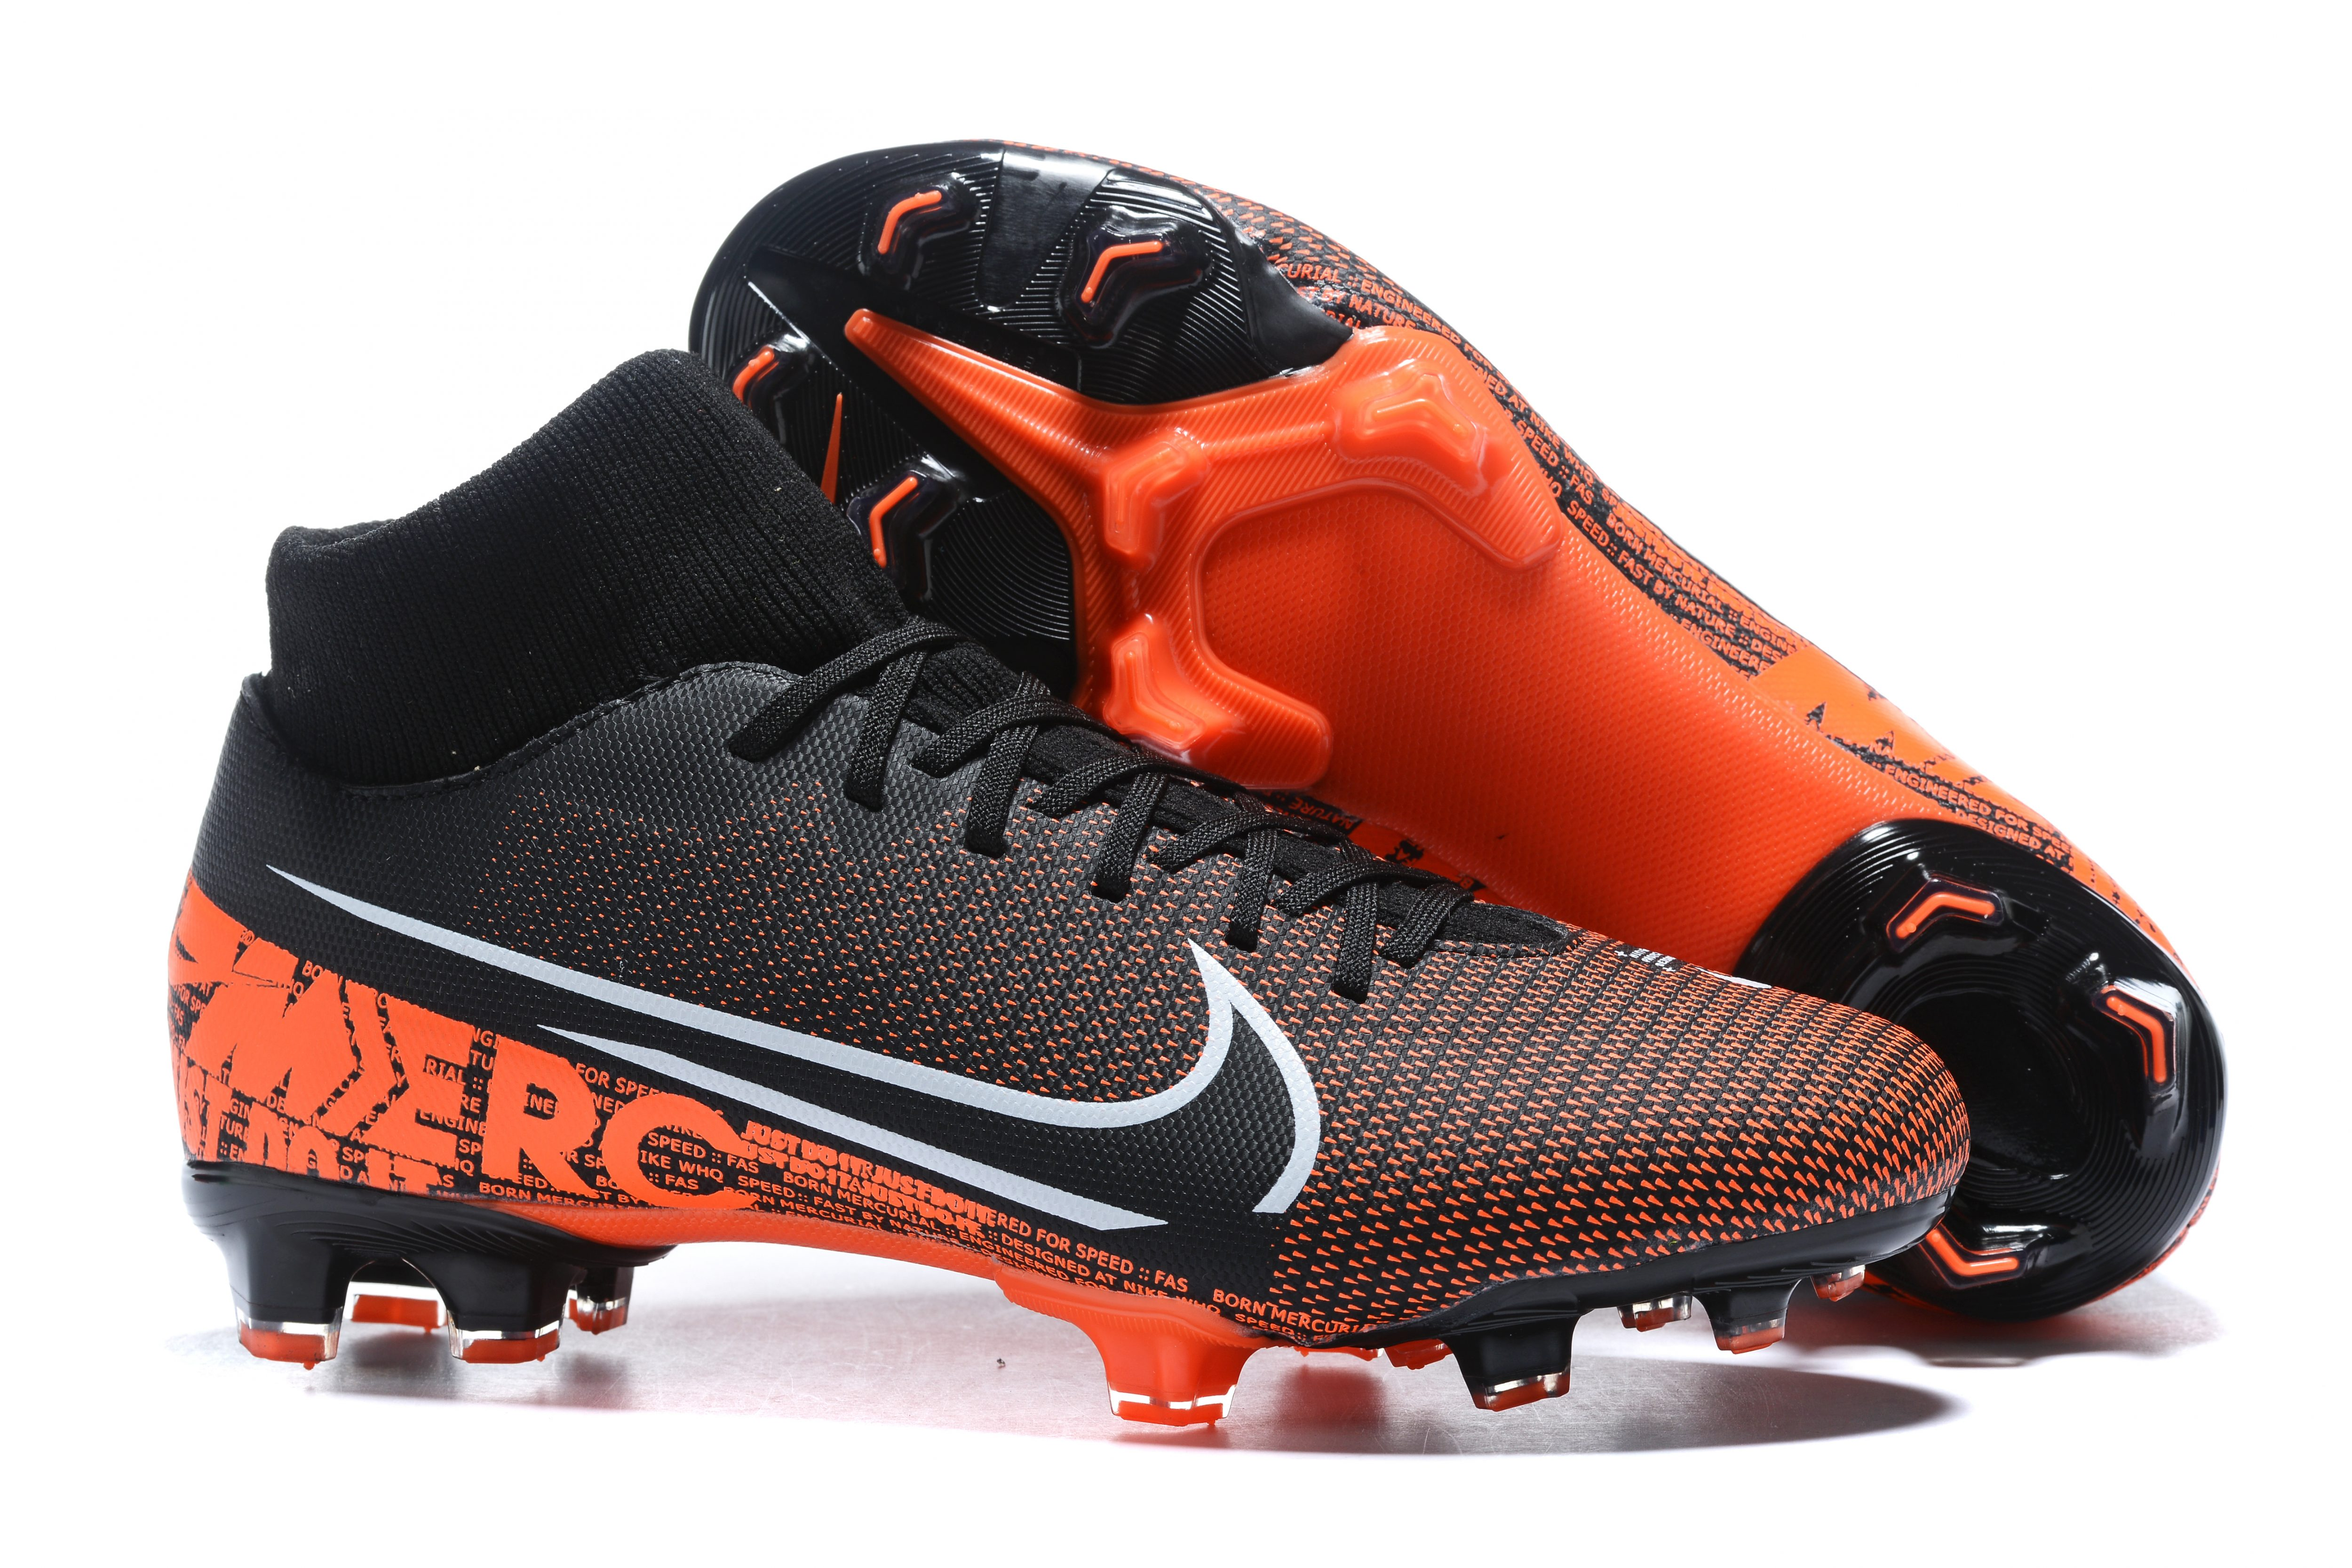 Nike Mercurial Superfly VII Club FG-Black red Sell